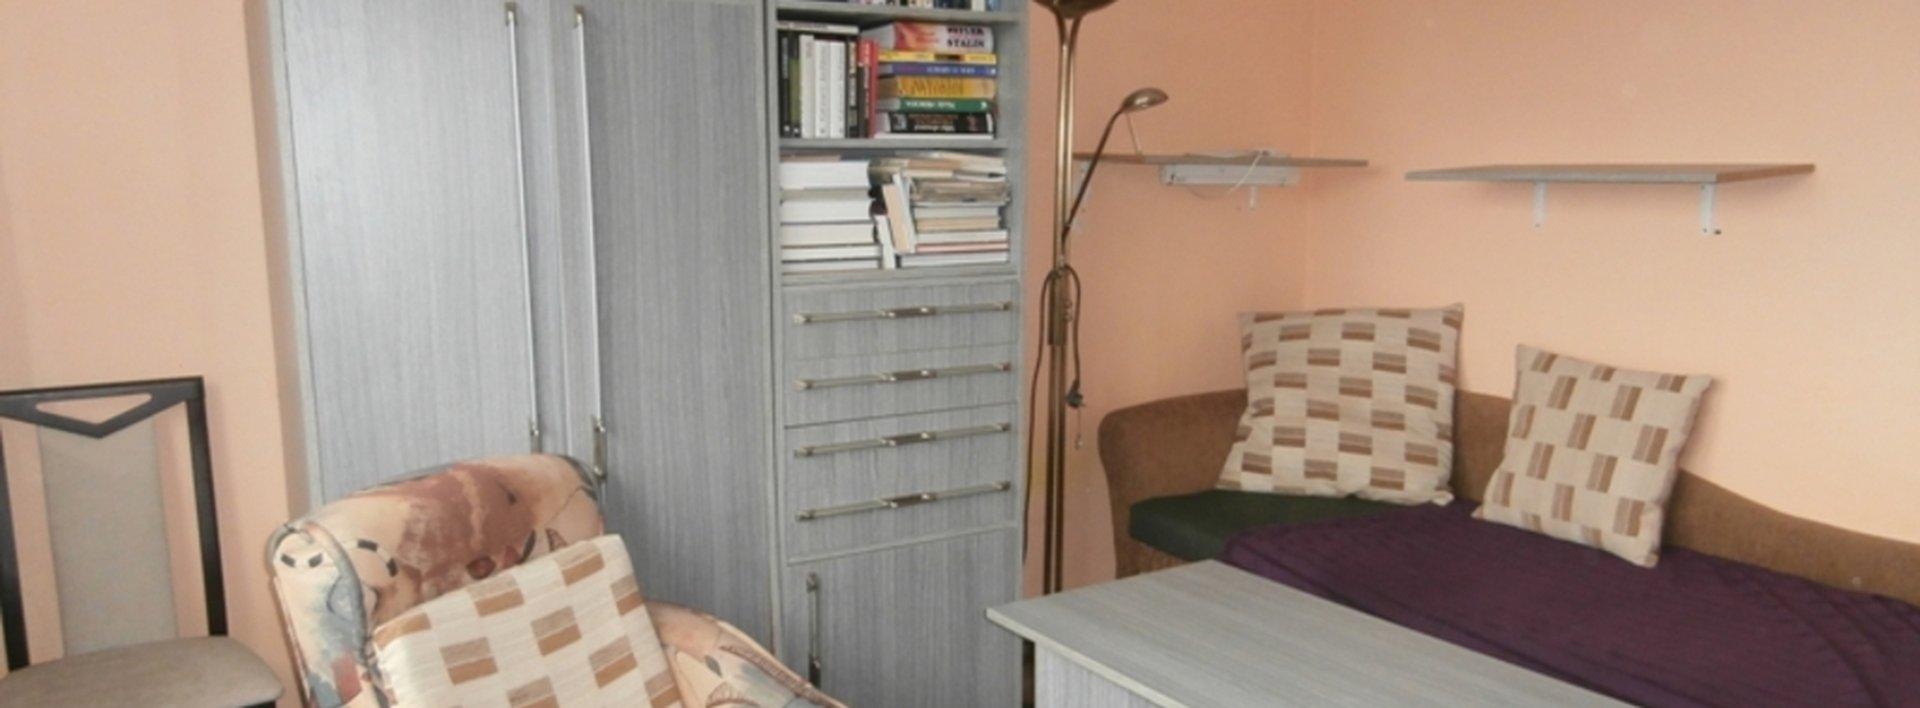 Prodej bytu 1+kk, 27m², Ev.č.: N46418